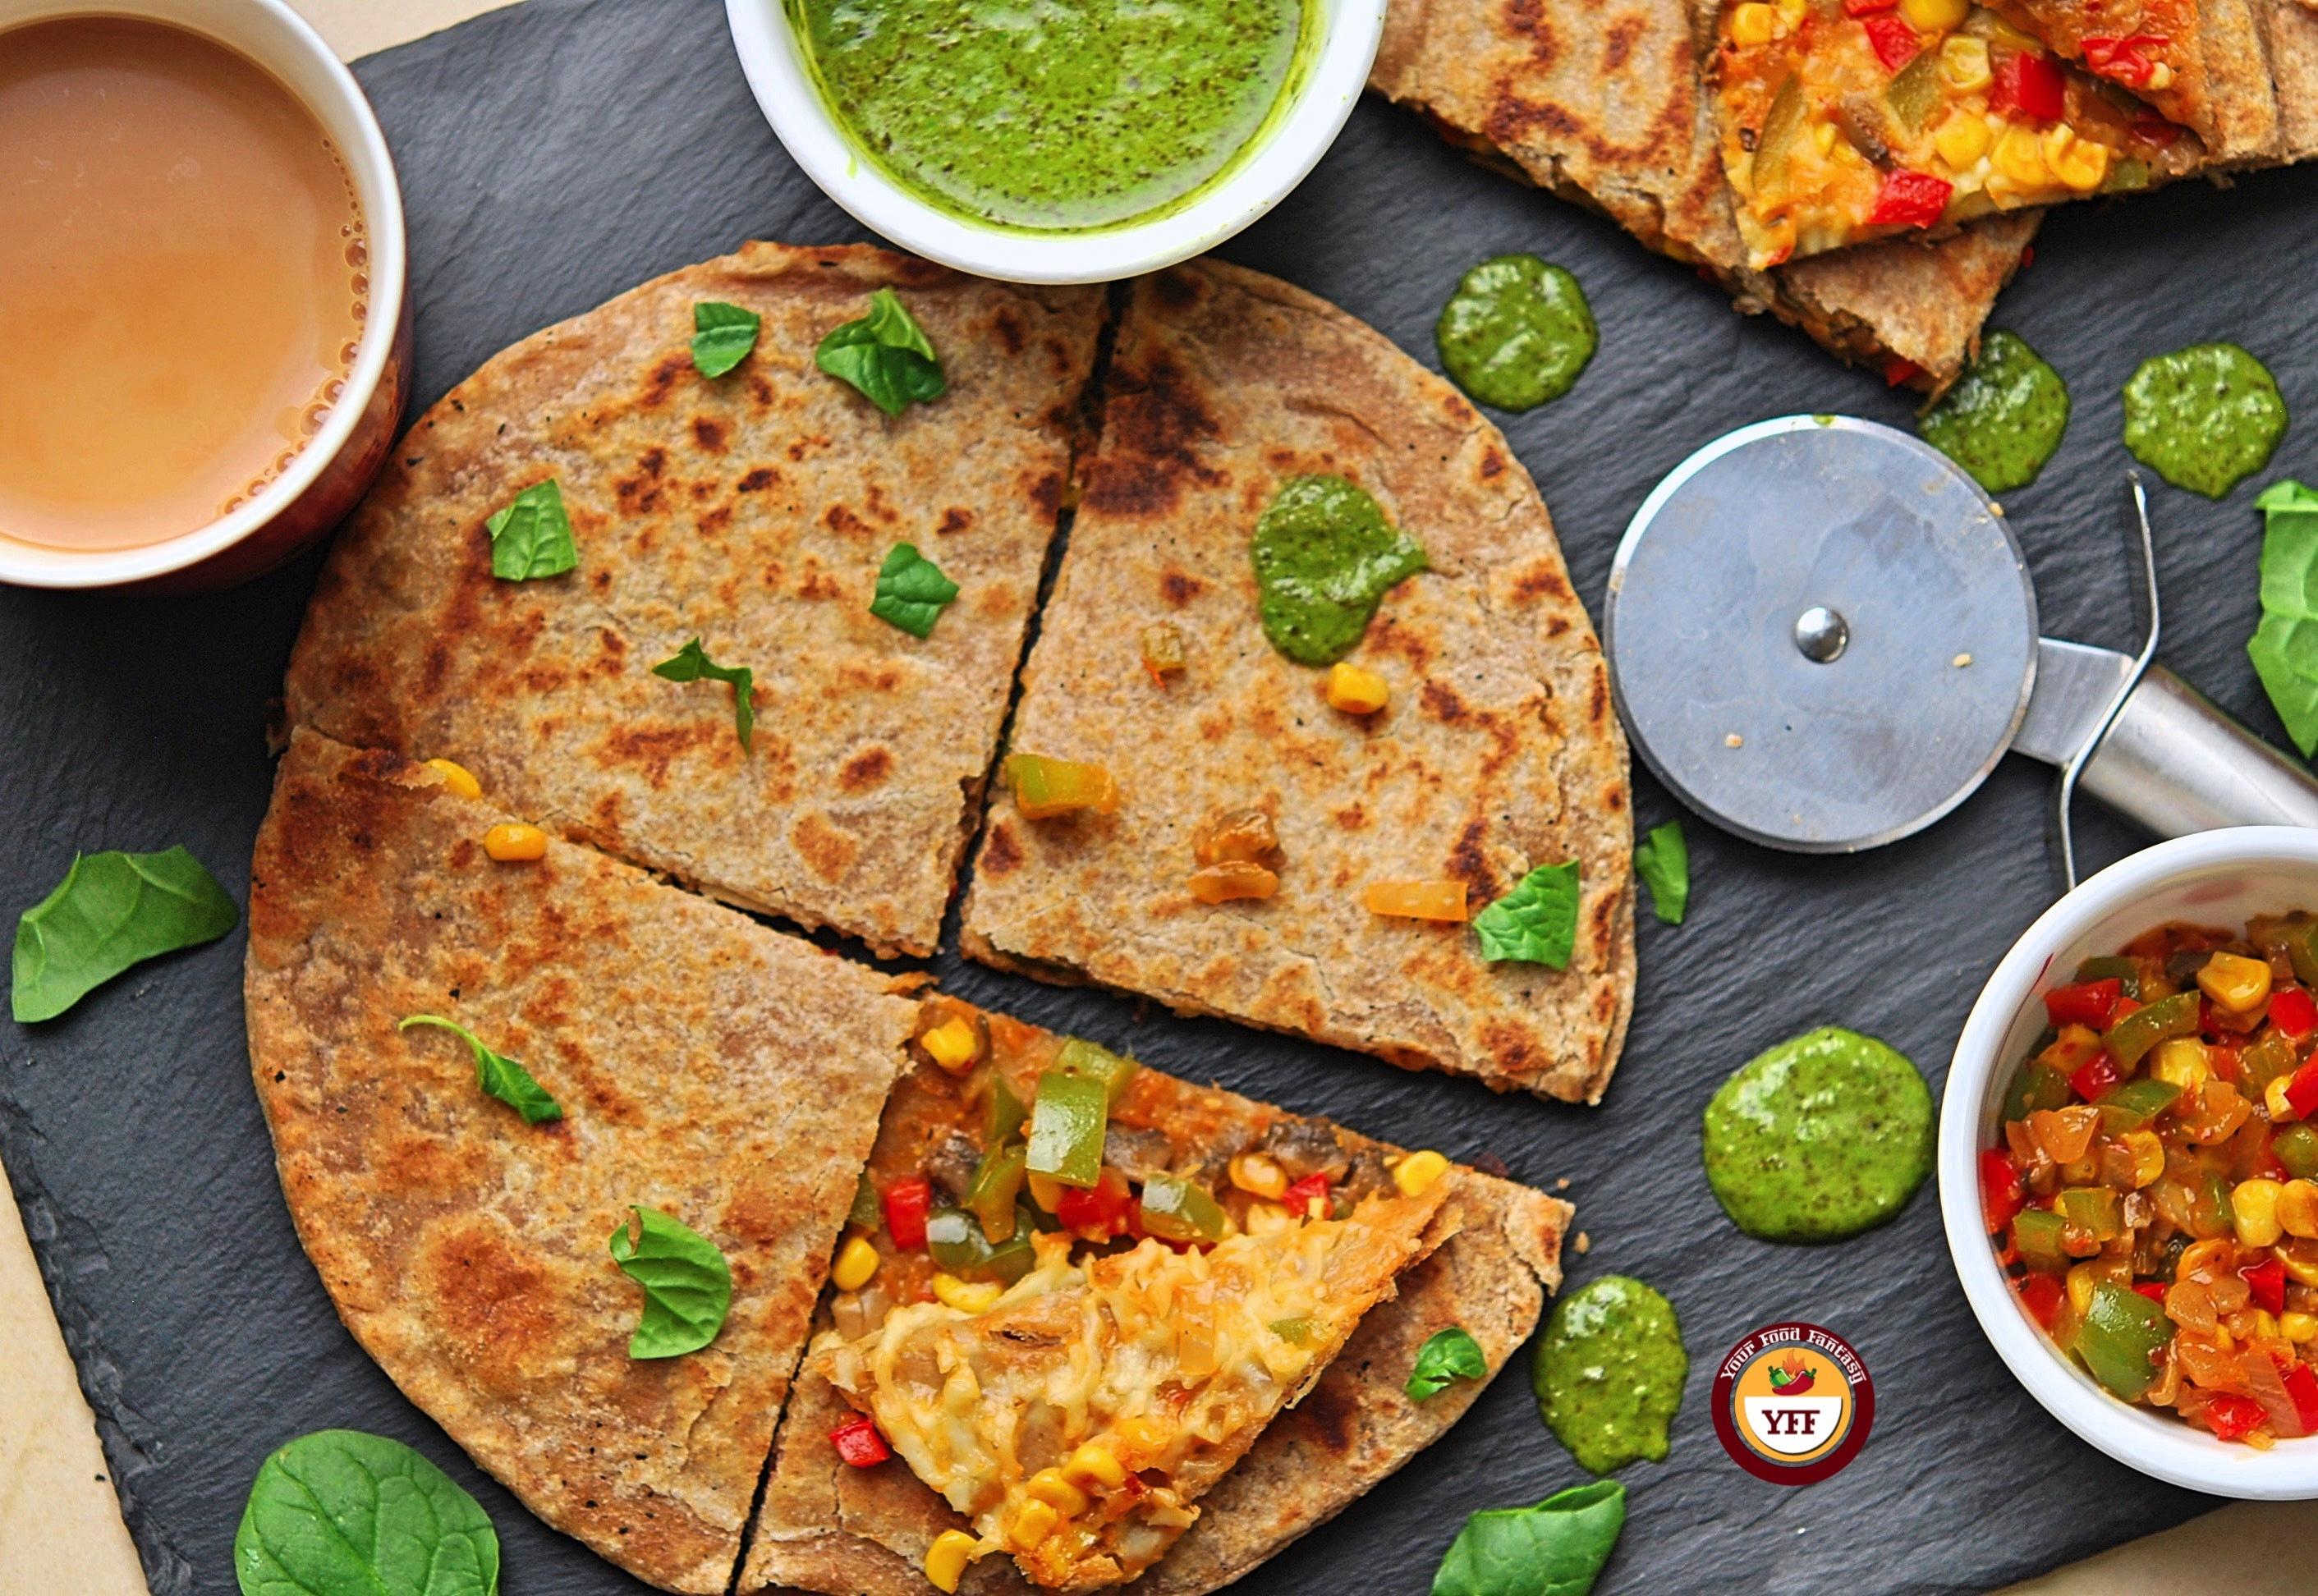 Kid Friendly Pizza Paratha Recipe | Your Food Fantasy